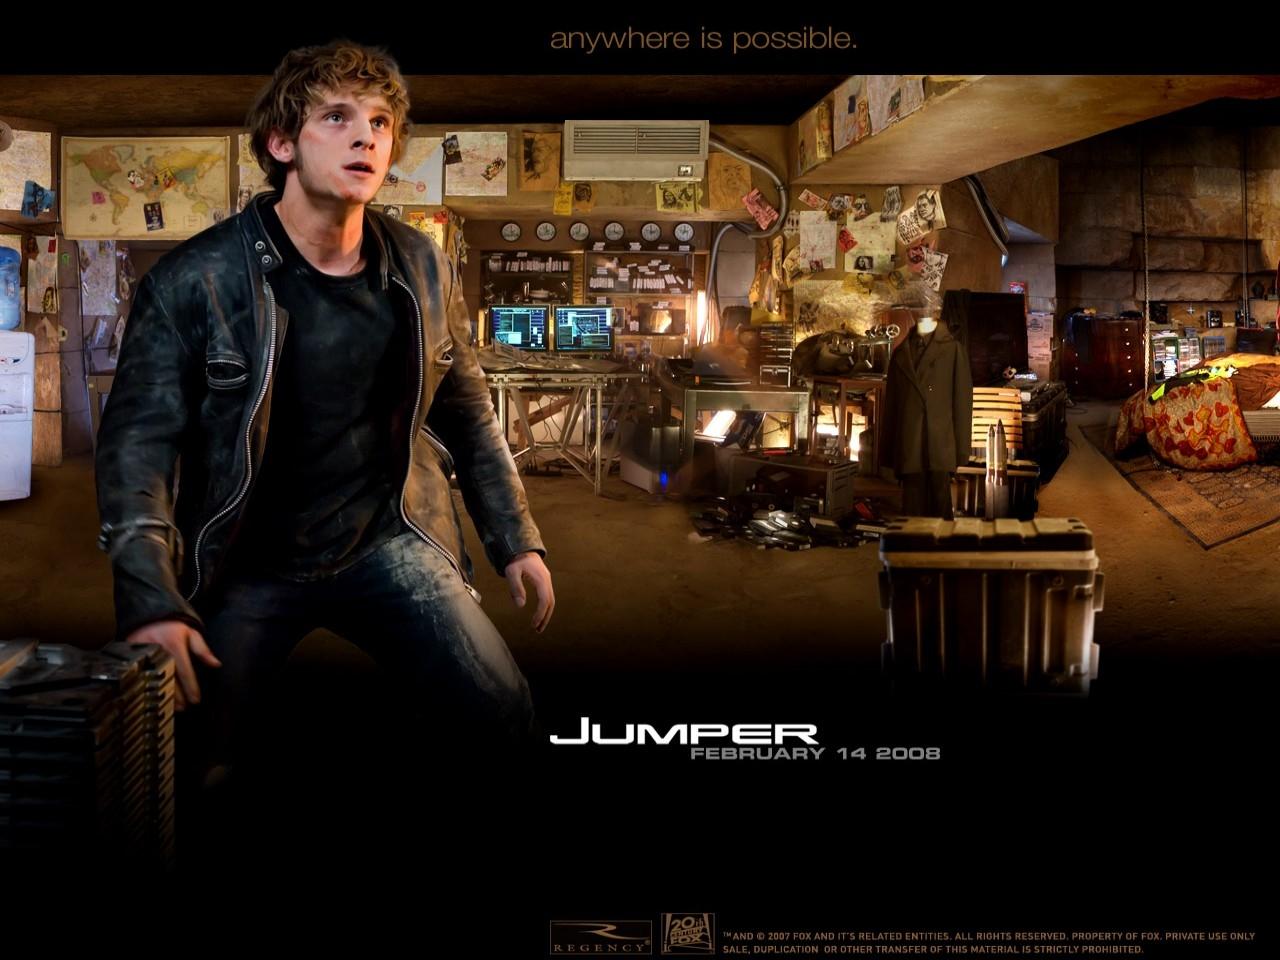 Wallpaper del film Jumper - Senza confini con Jamie Bell